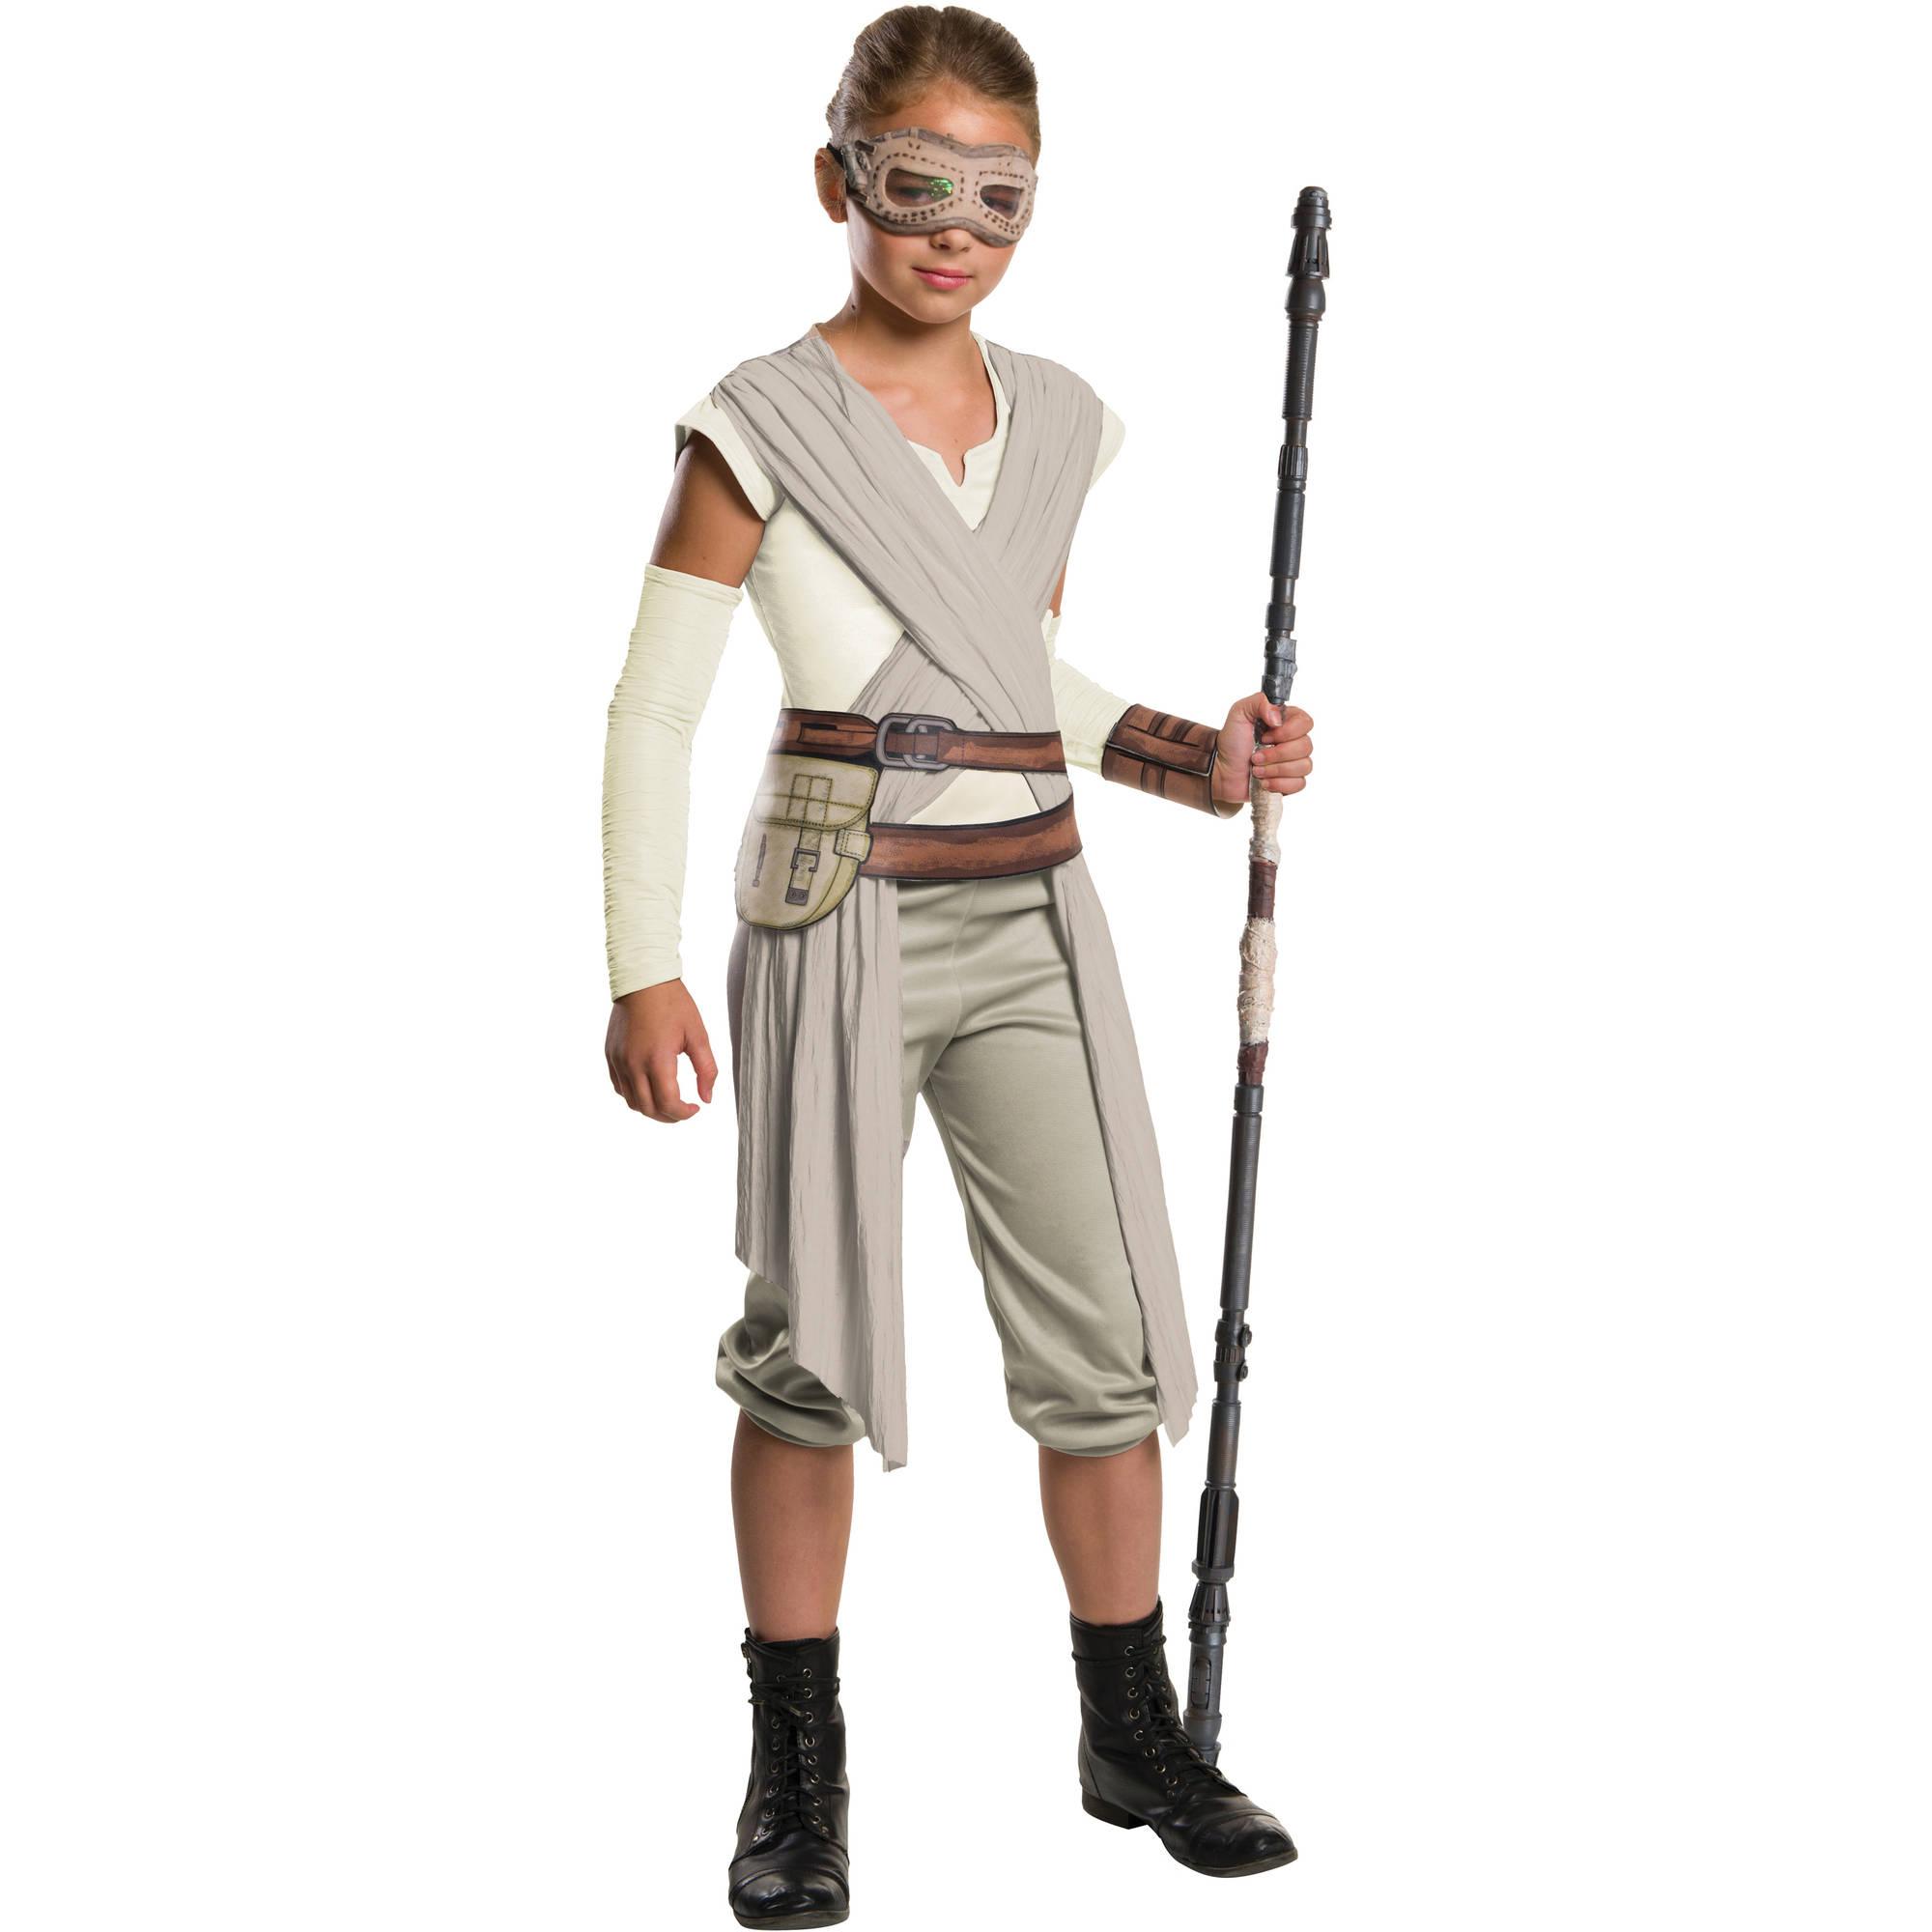 Rubie's Costumes Star Wars Rey Eye Mask Halloween Costume Accessory